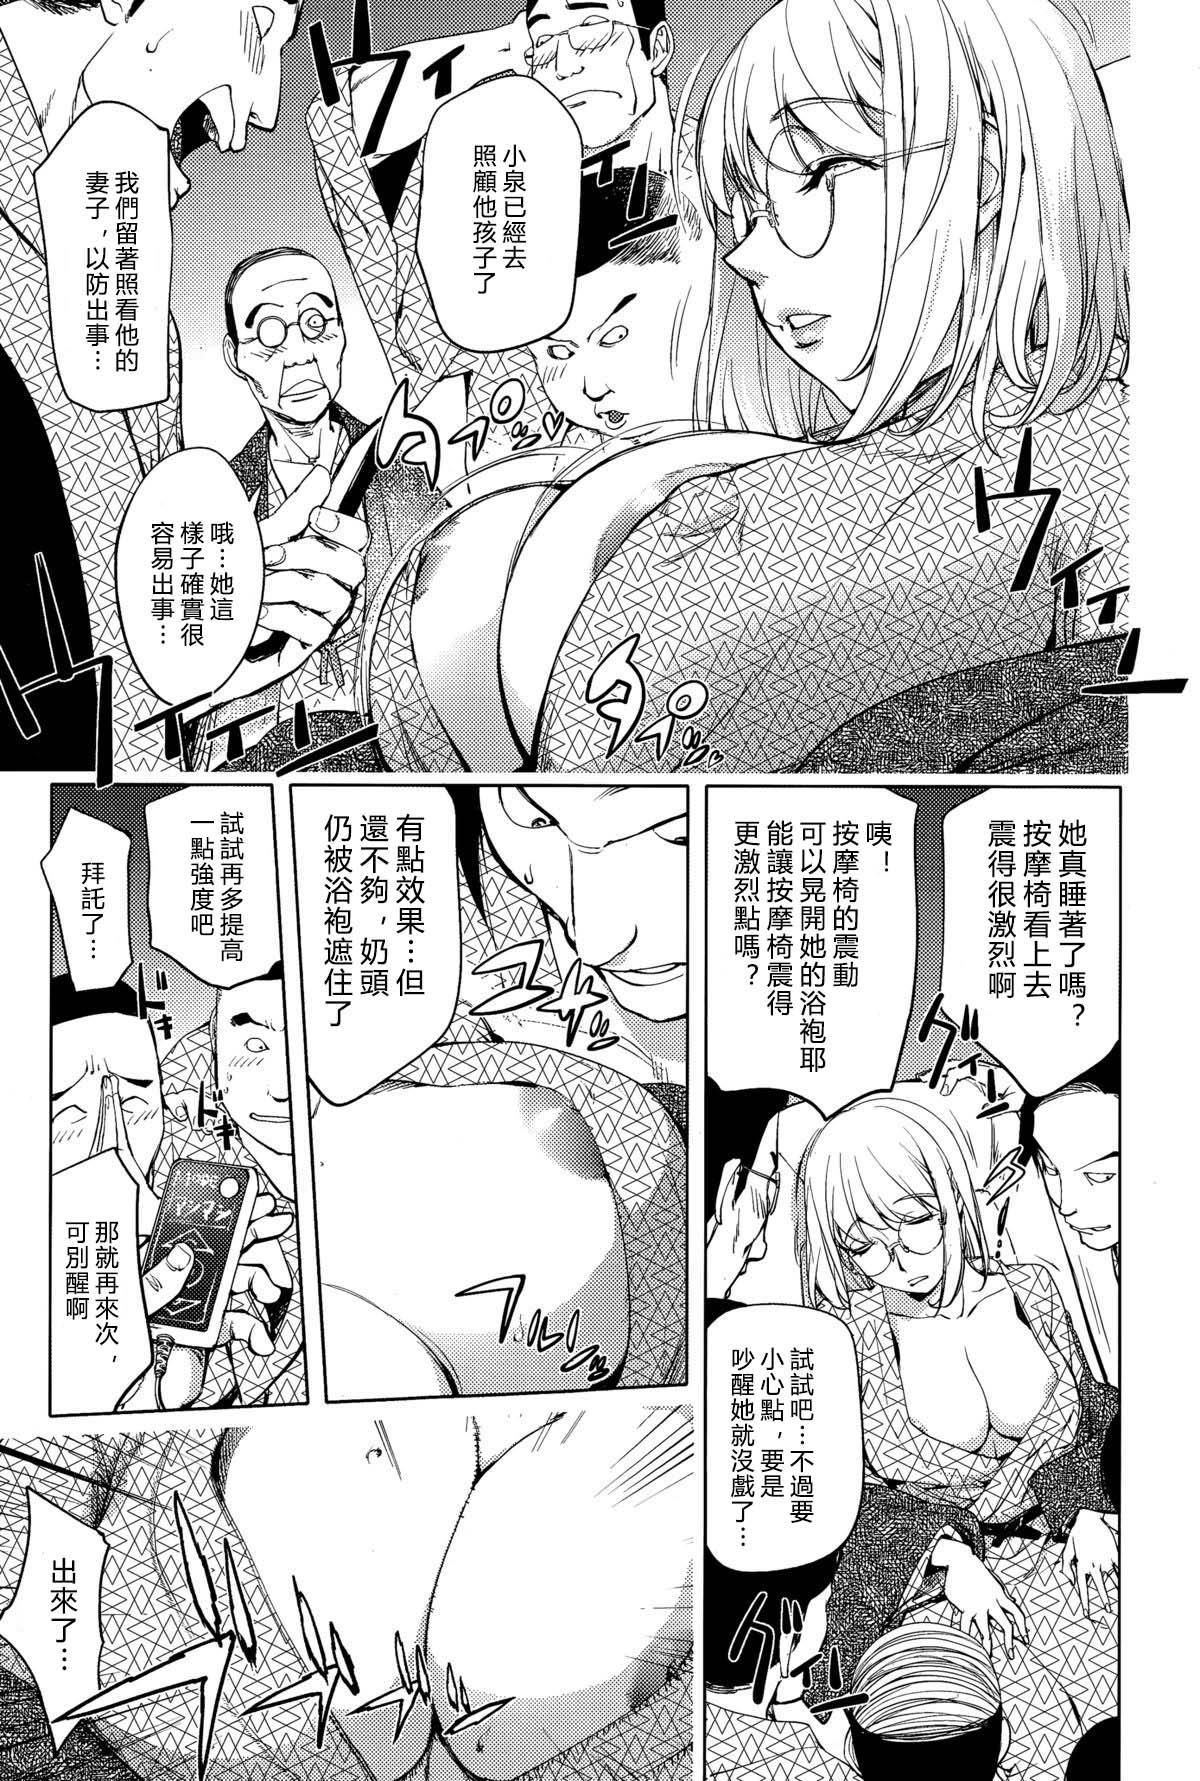 [Kon-kit] Yukemuri no Naka no Kaya-nee!   Kaya-nee At The Hotsprings (Comic Toutetsu 2015-02 Vol. 3) [Chinese] [蒟吉人個人漢化] 2